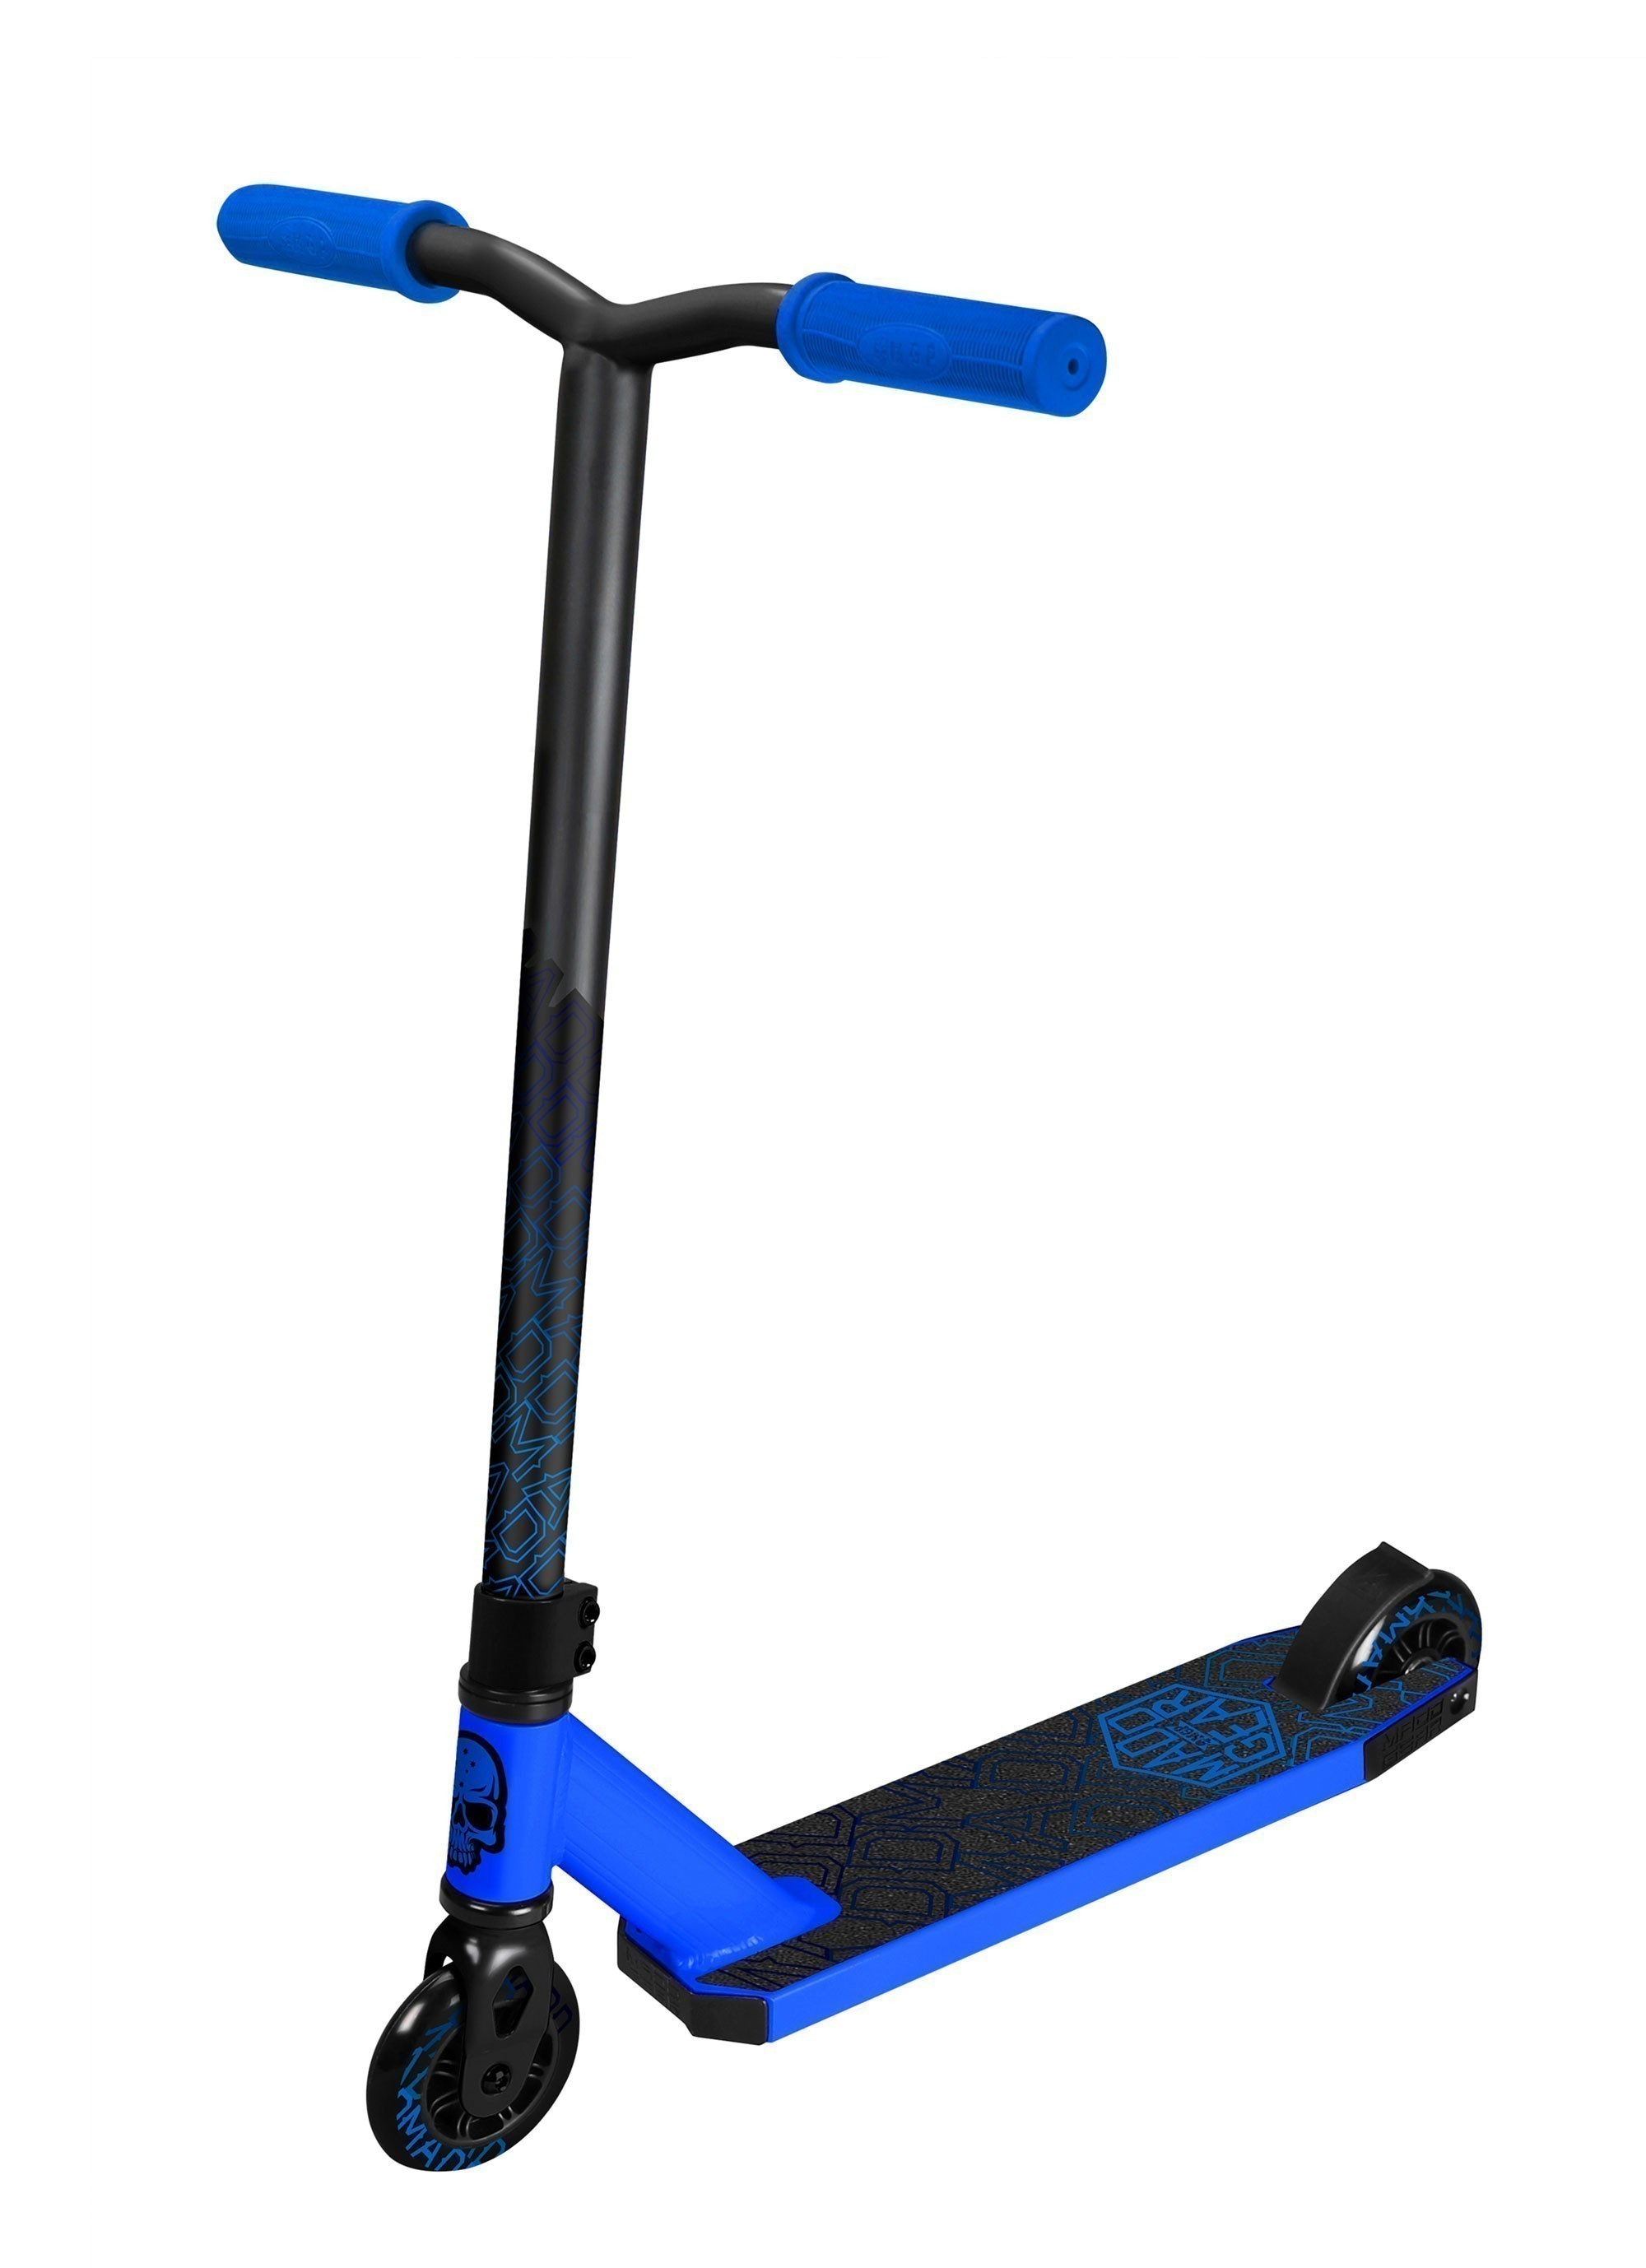 Tretroller, Kinderroller, Scooter MADD GEAR Kick Rascal blau Bild 1